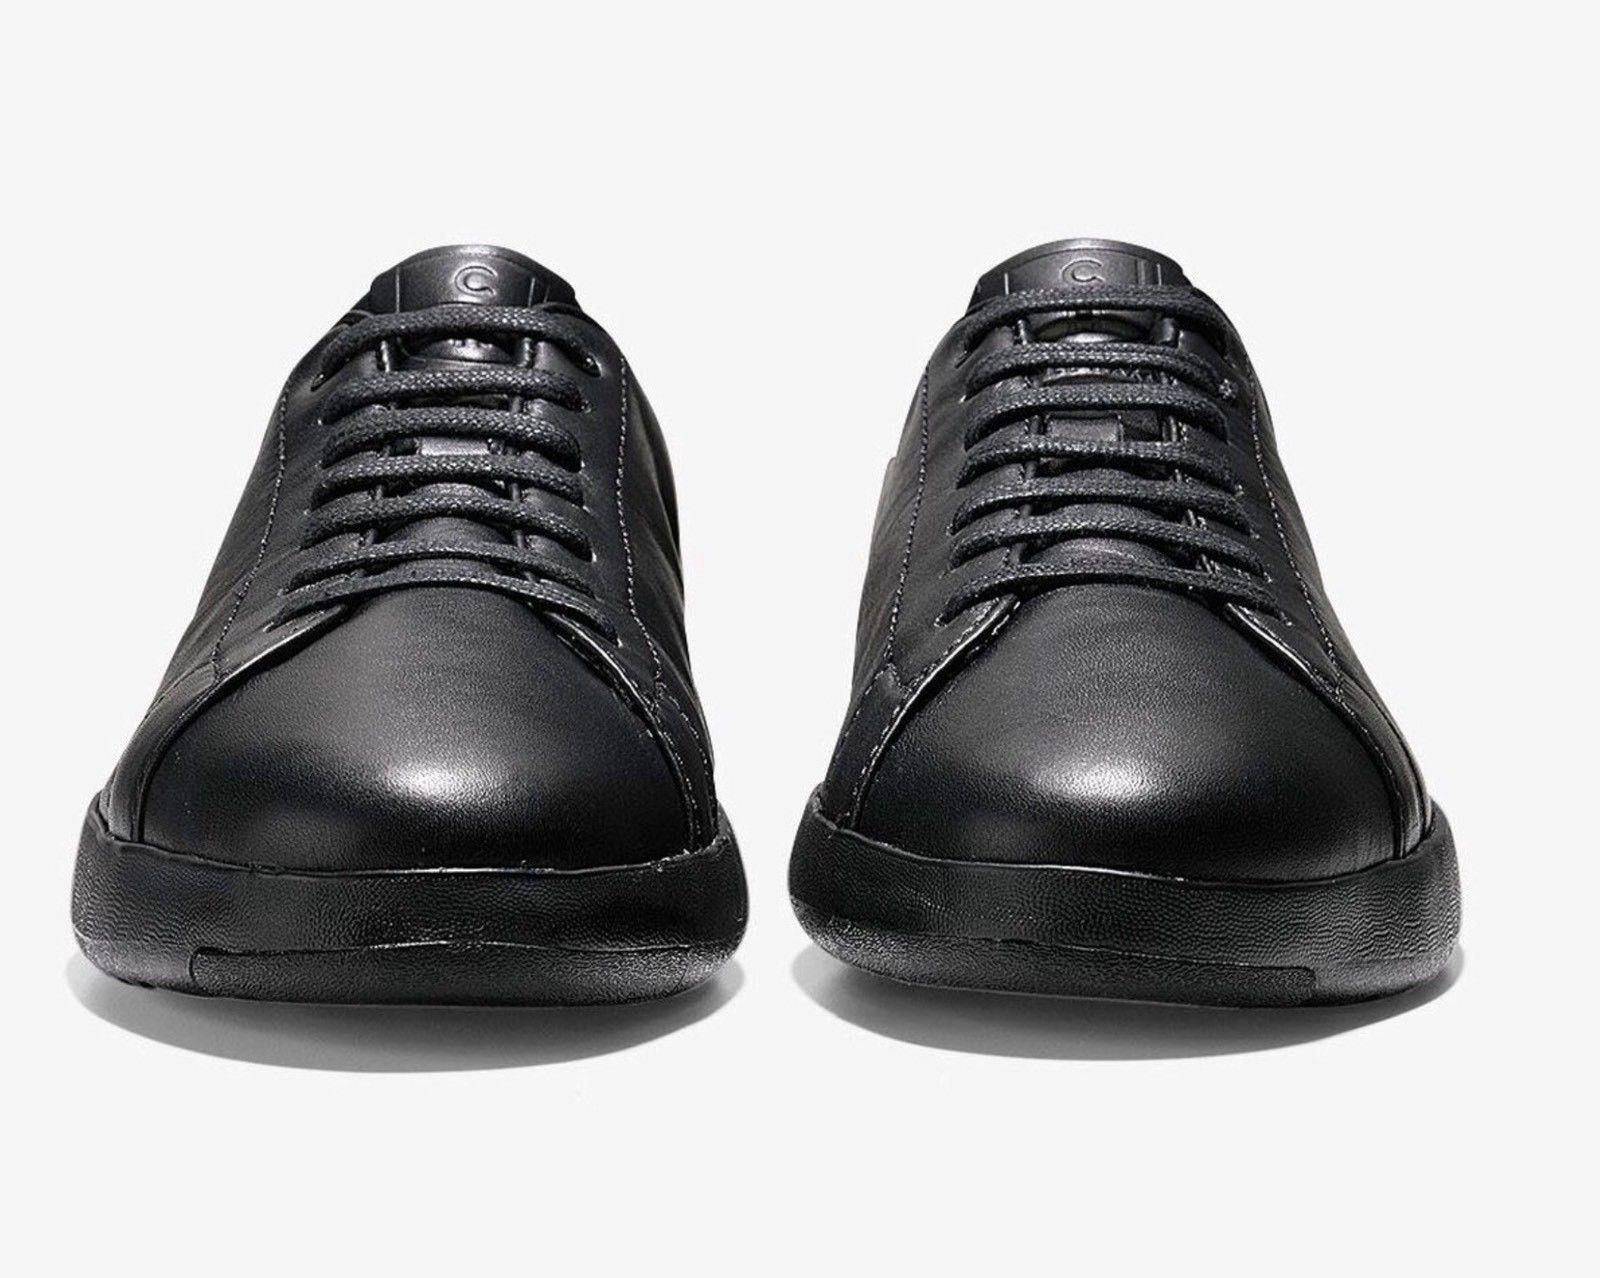 Cole Haan Men's Men's GrandPro Tennis  Fashion Sneakers Sizes 7 thru 10.5